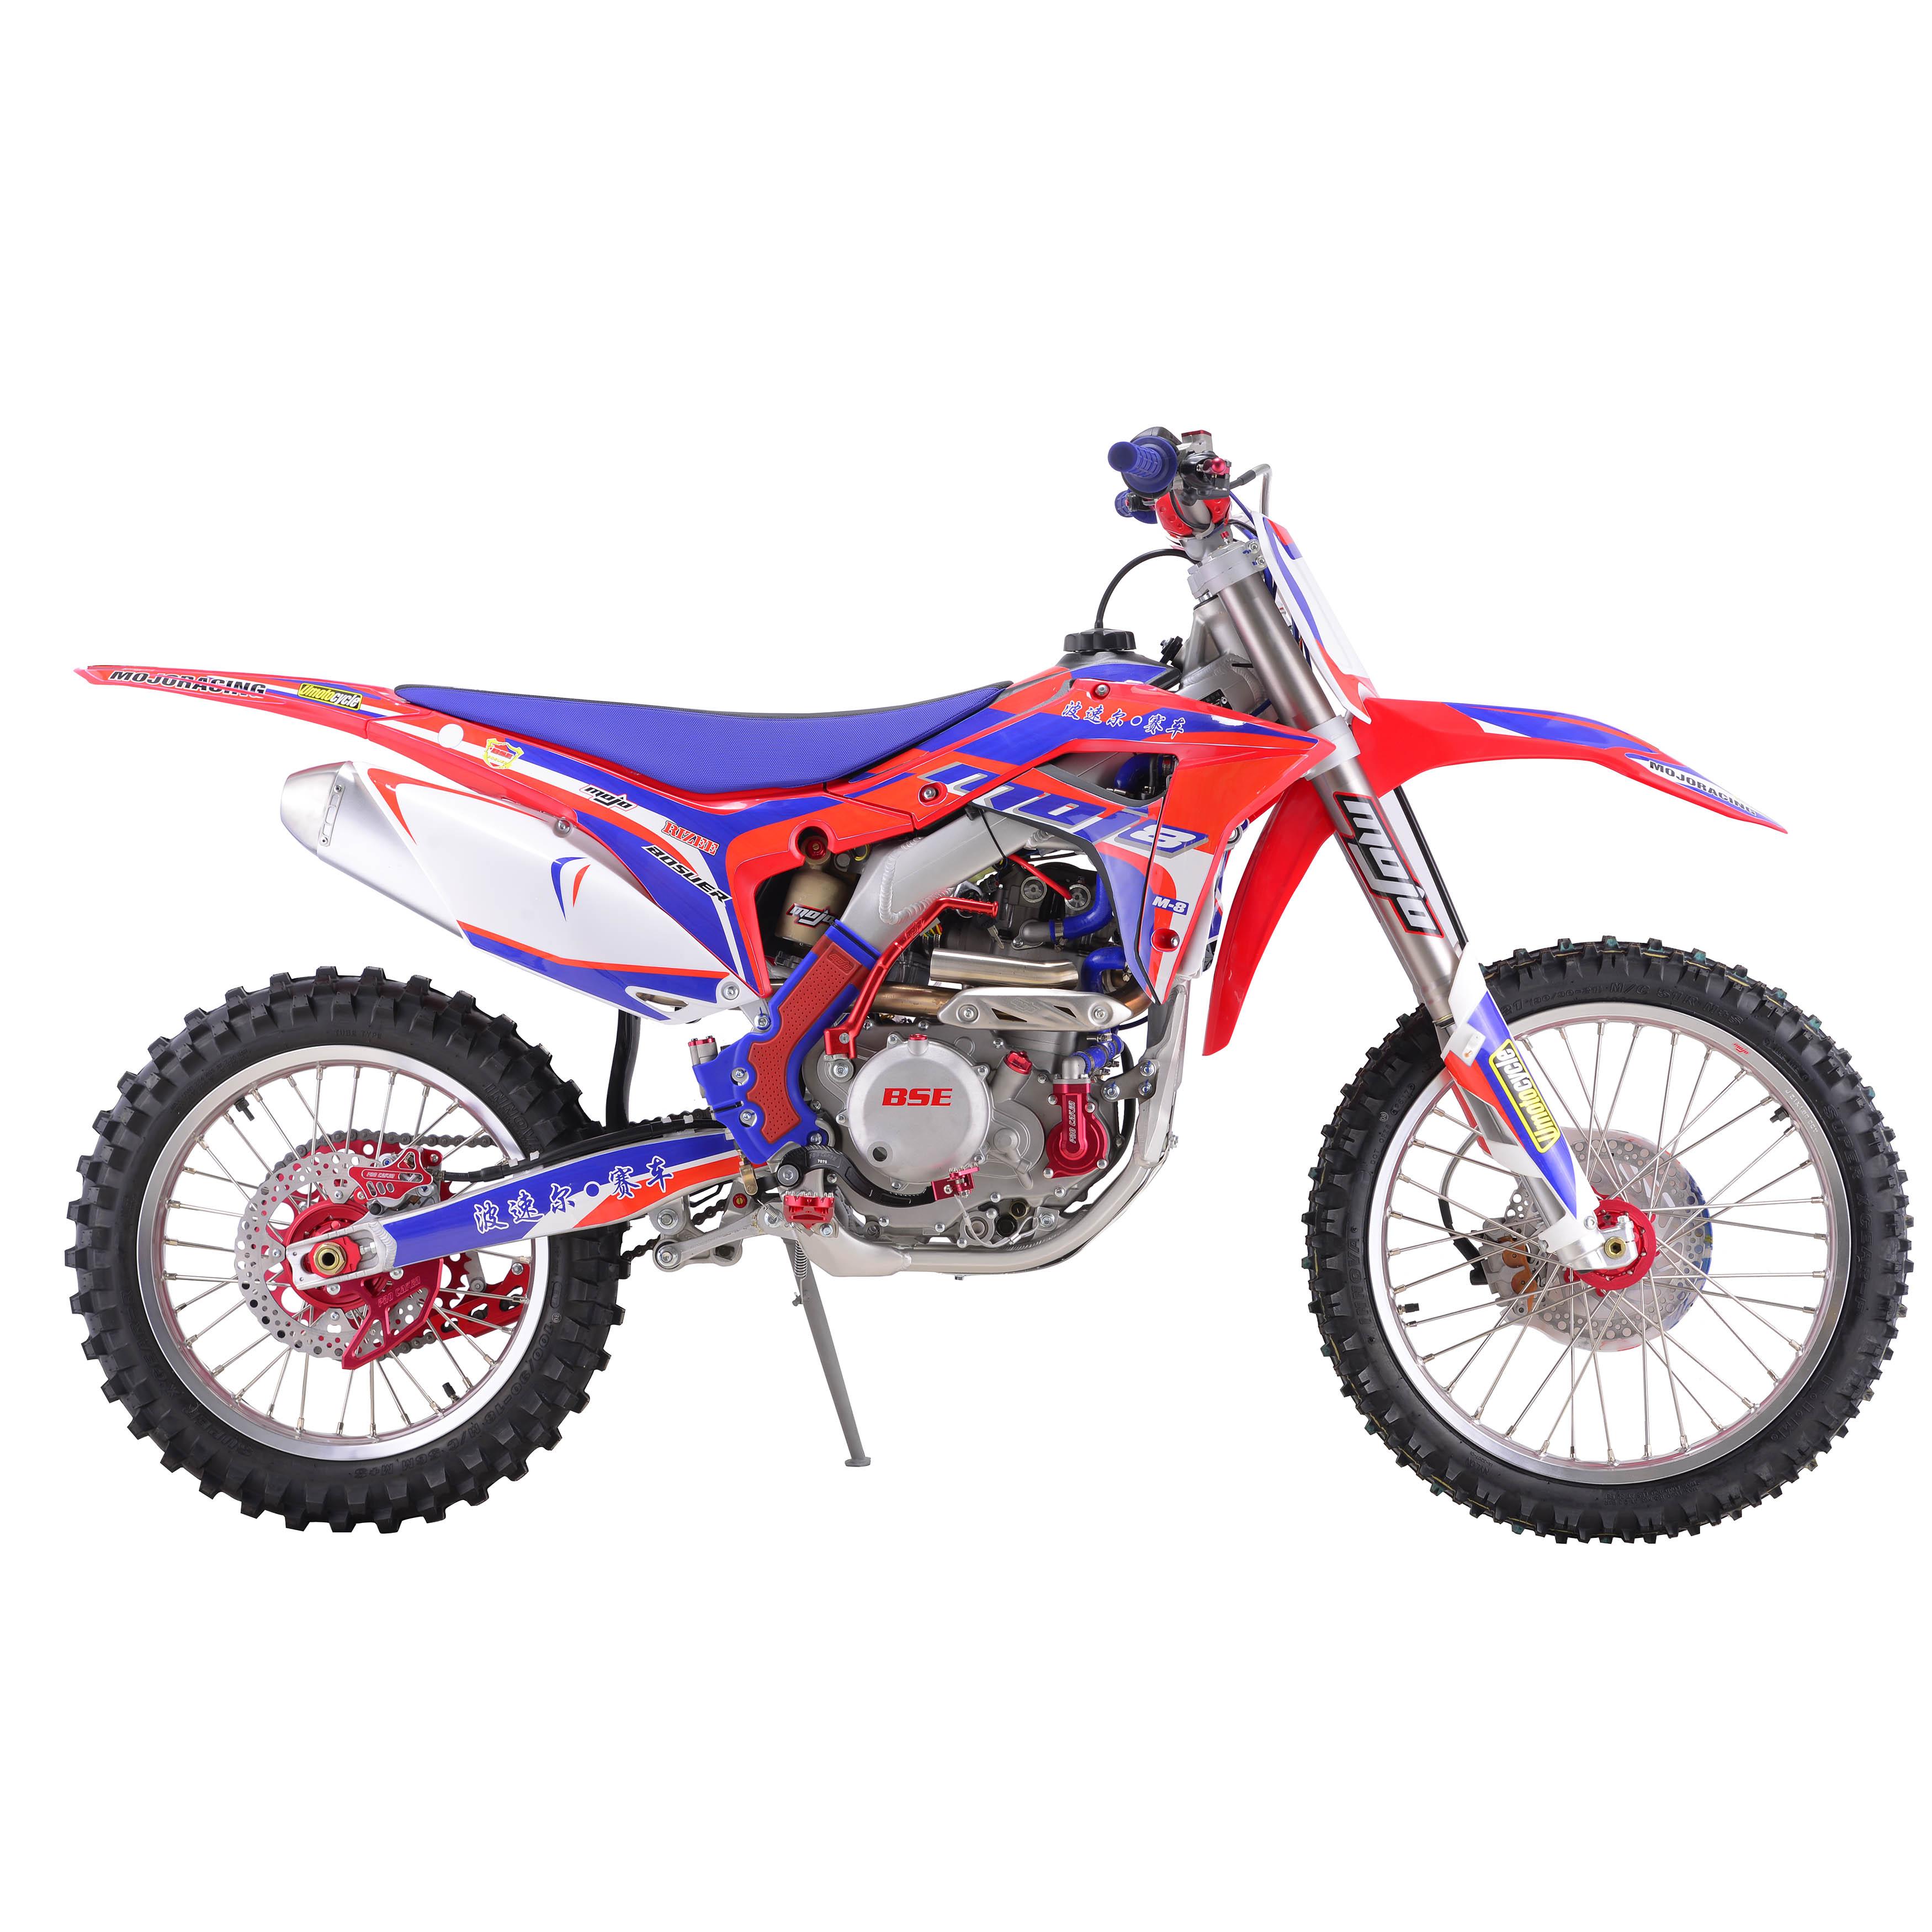 dirt bike BOSUER M450 450cc